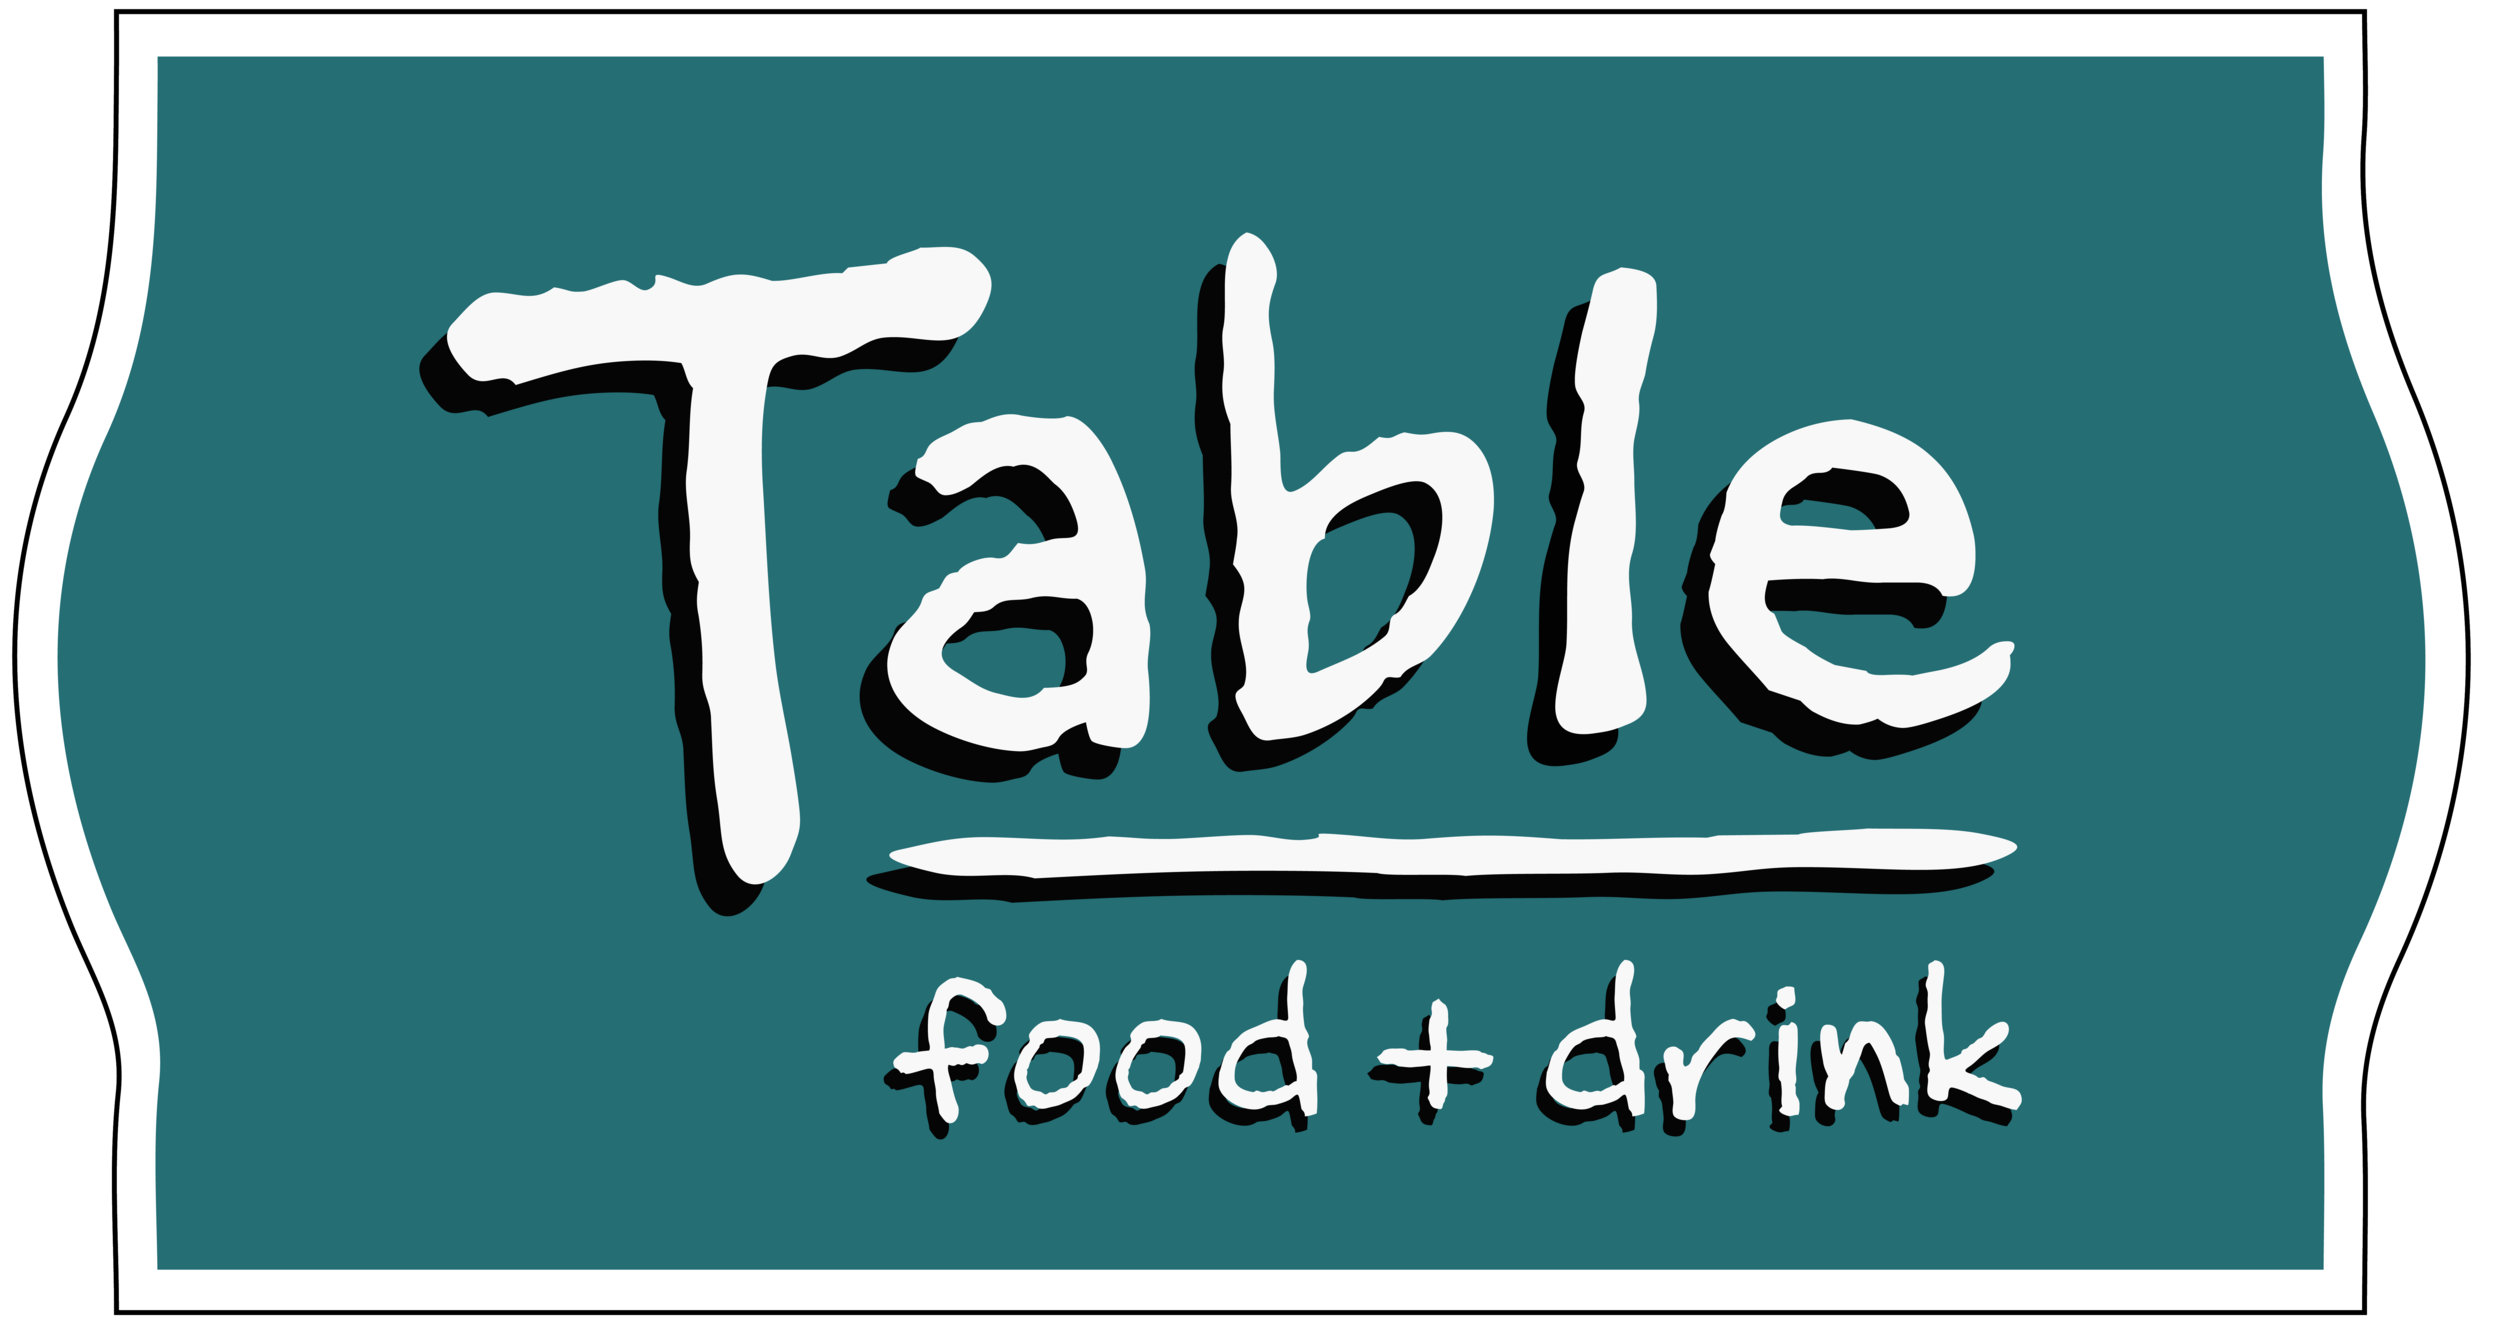 please visit our new website at tablefooddrink.com